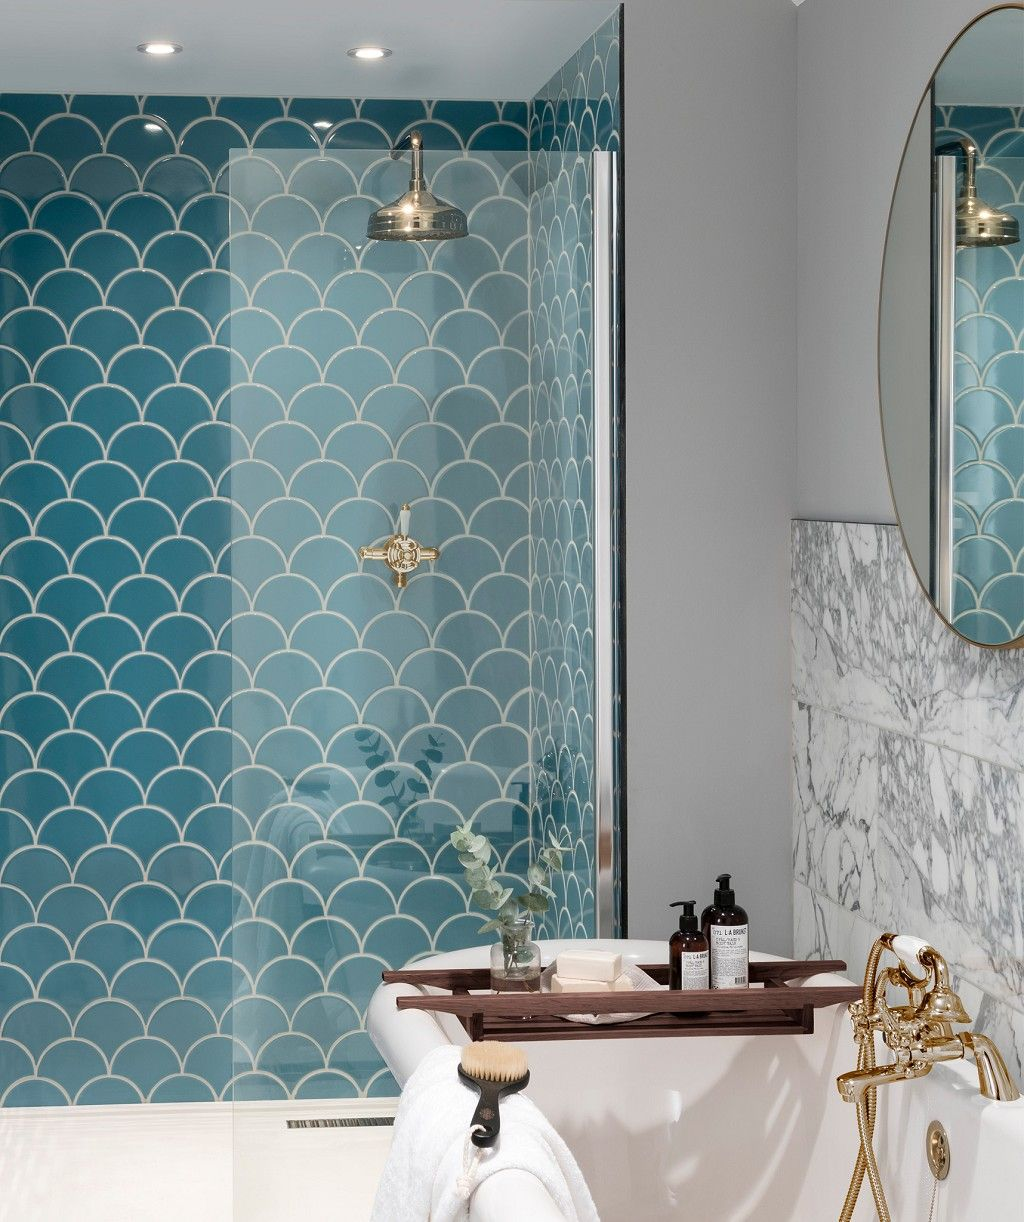 Syren™ Nordic Blue Mermaid Scale Tile | Topps Tiles | my home ...